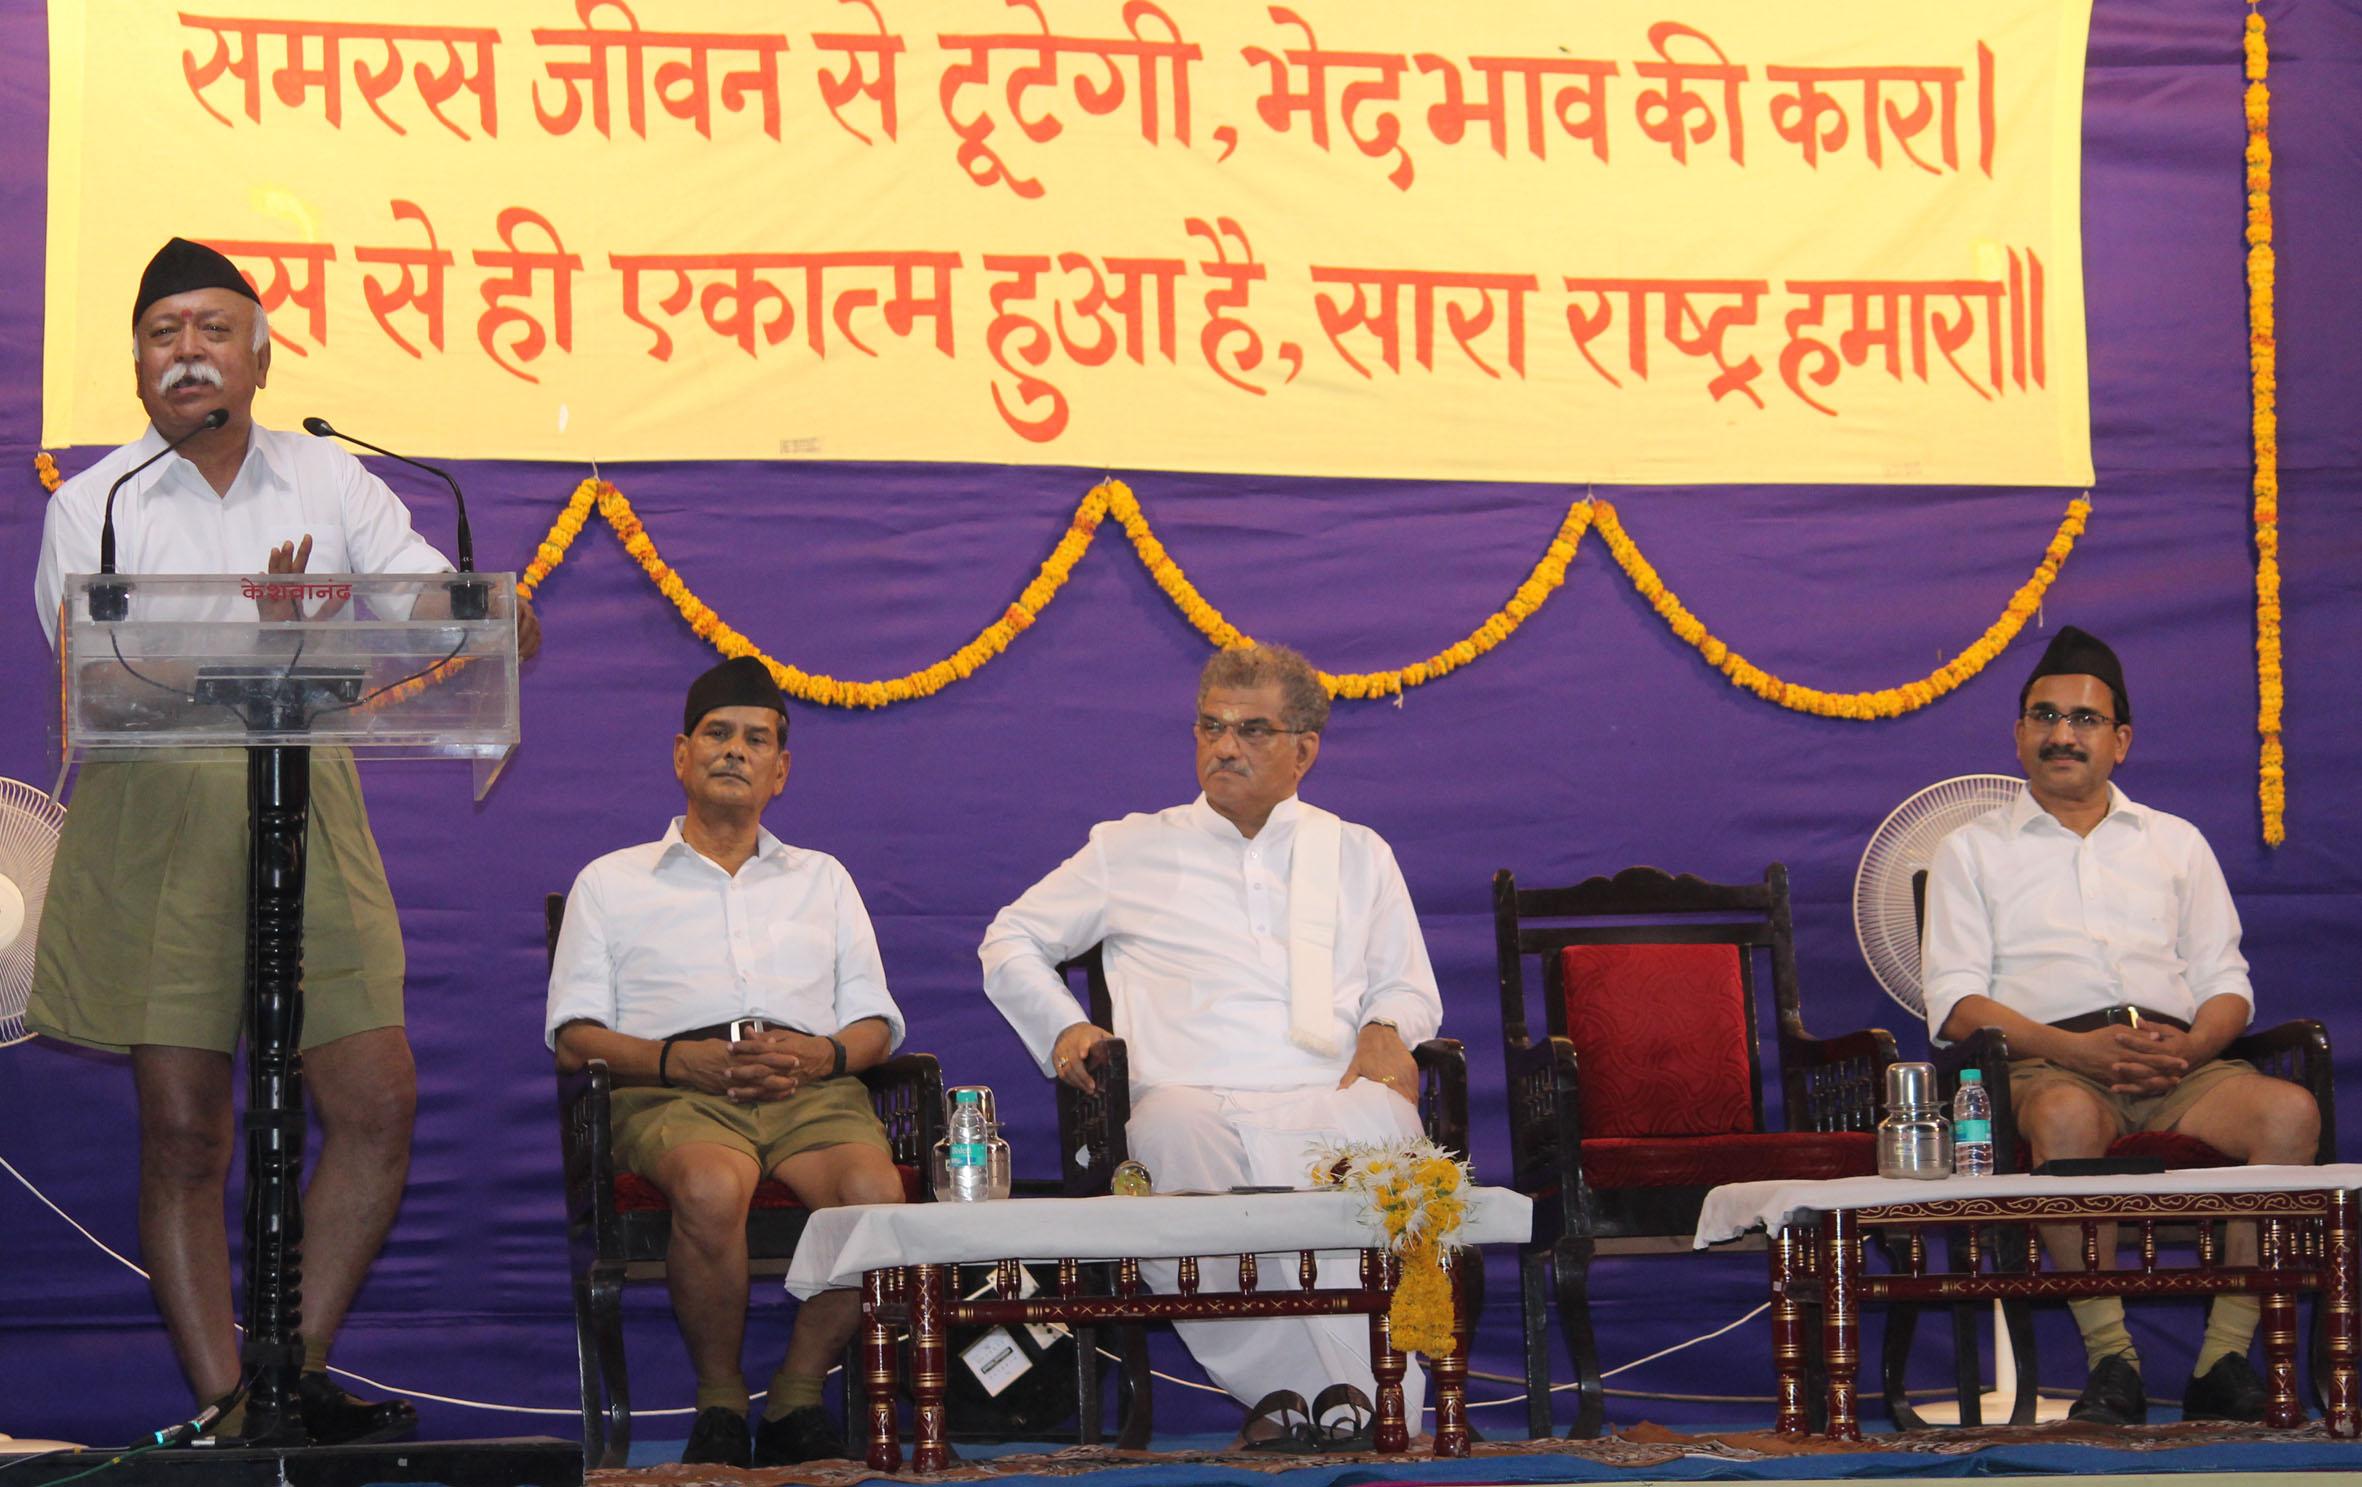 RSS Sarasanghachalak Mohan Bhagwat addressing